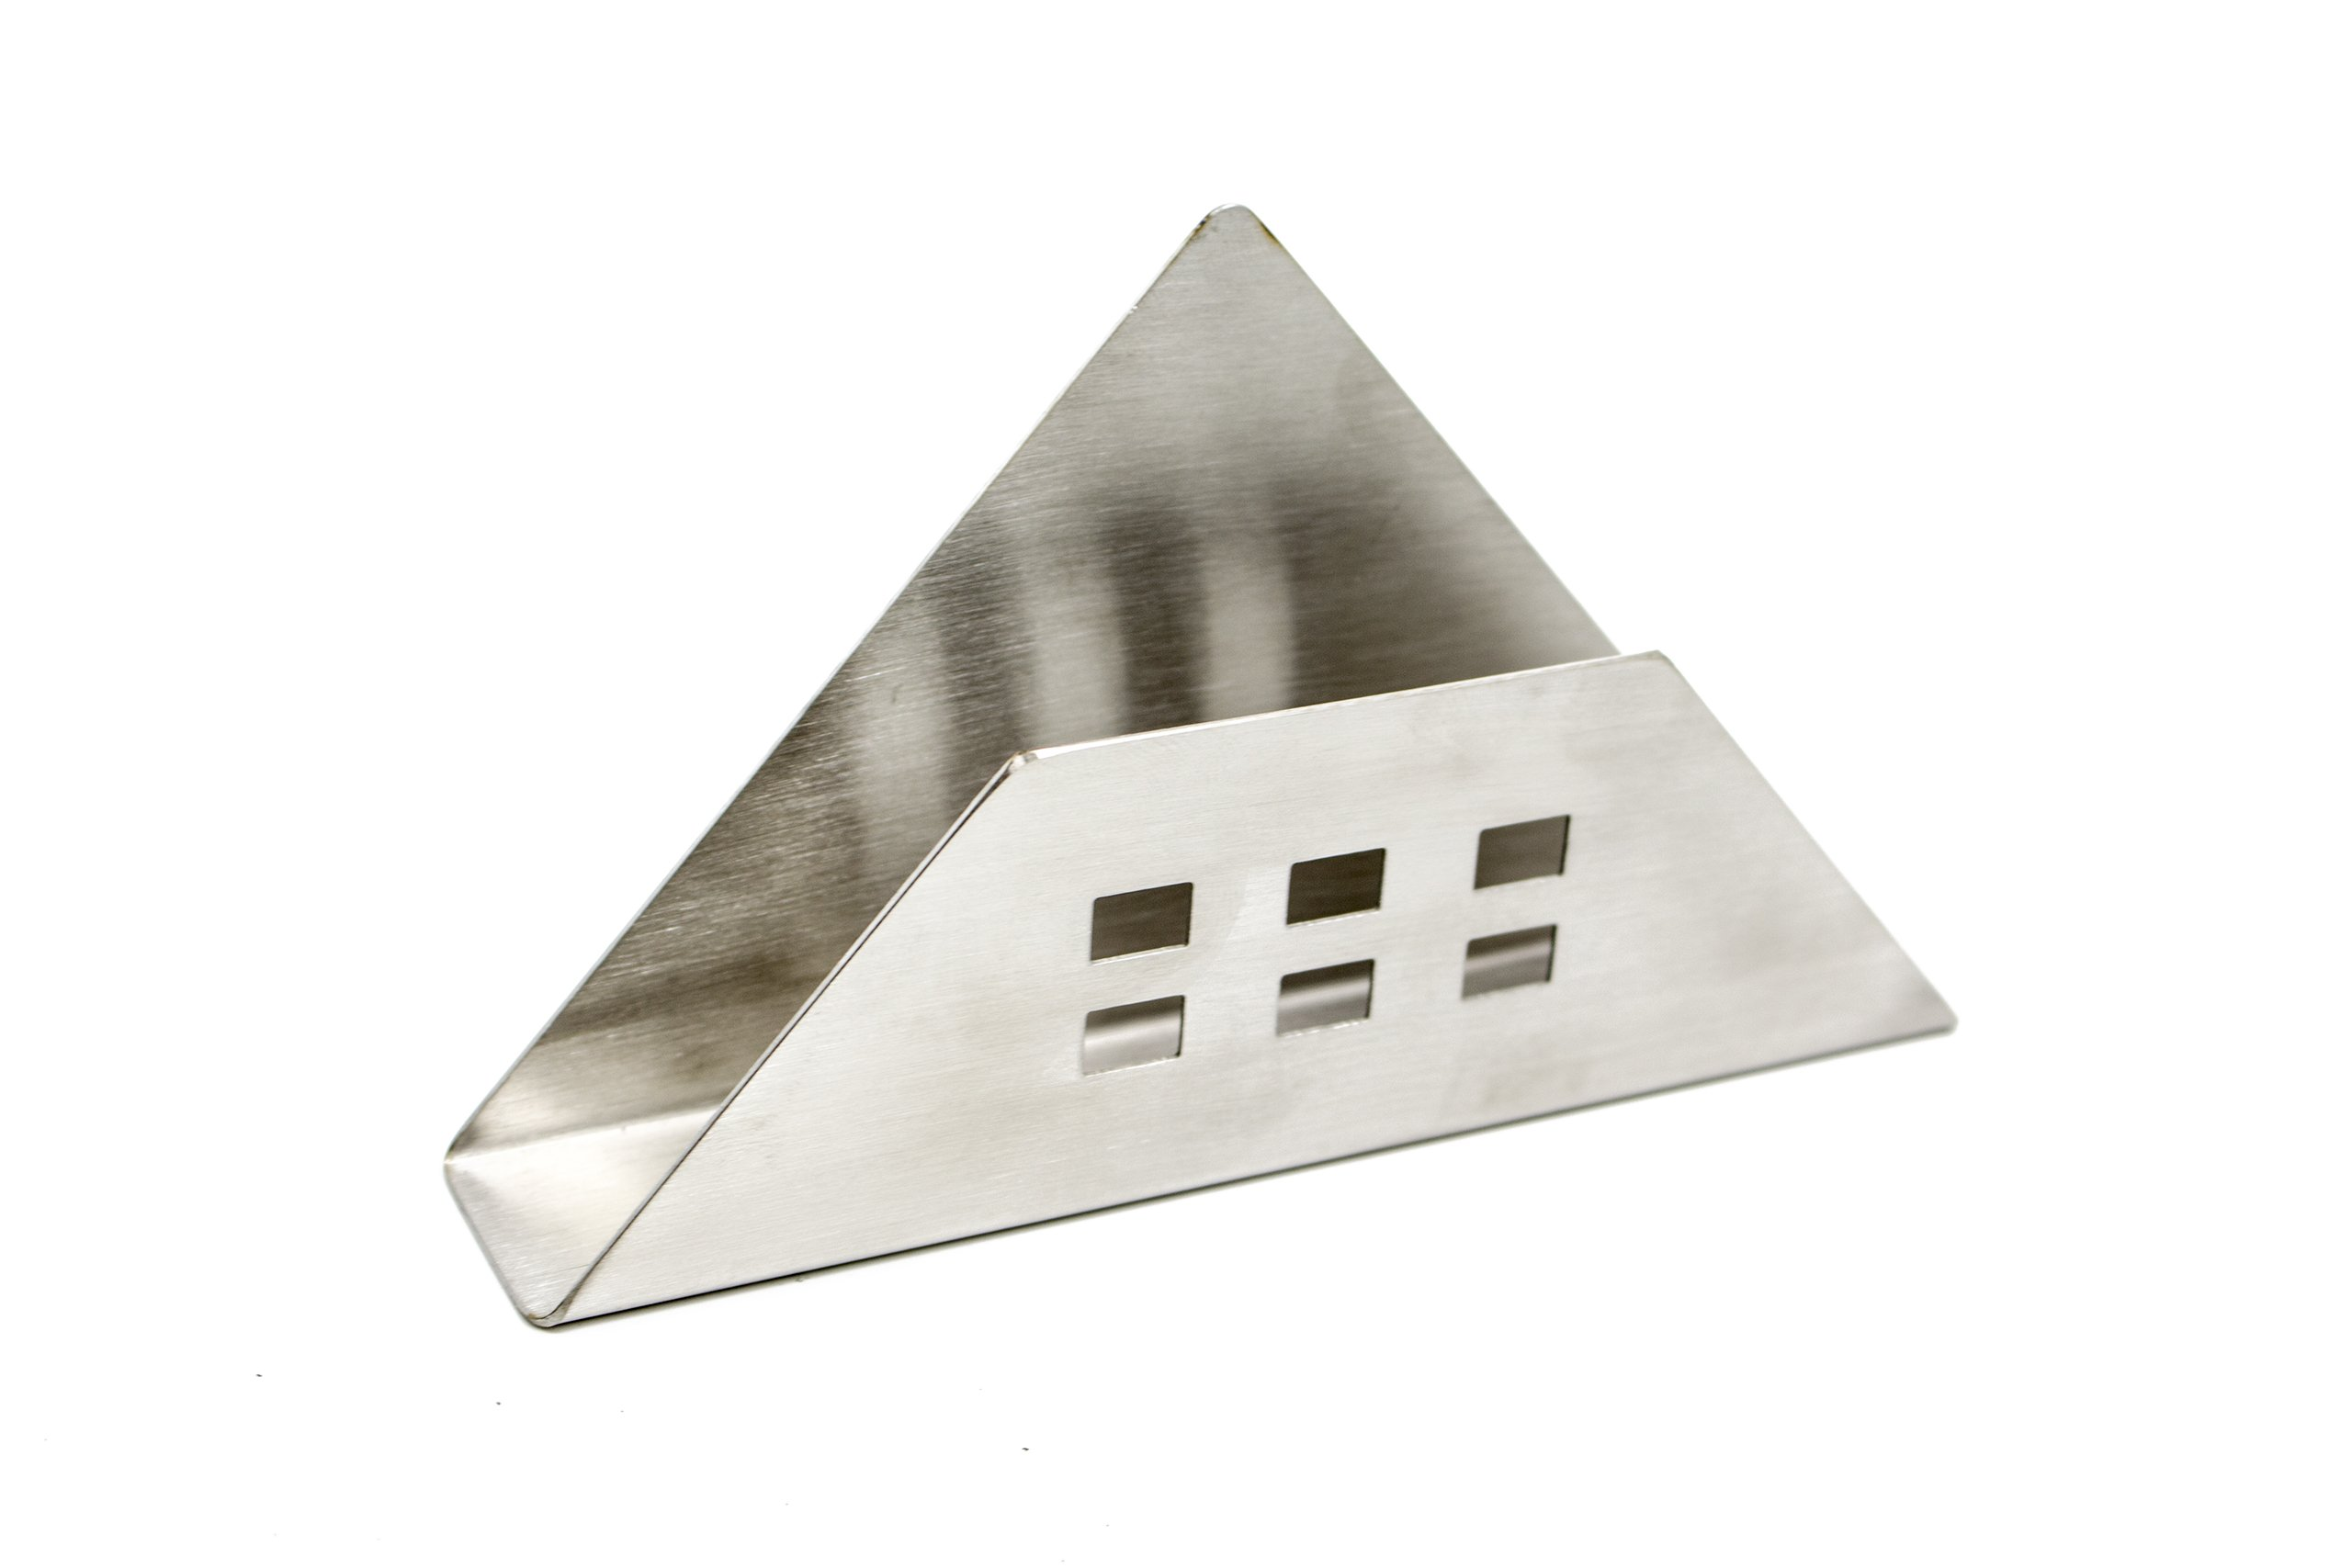 BaoHao 202 Stainless Steel Napkin Holder for Kitchen Countertops,Table,Home …V2  6.10''x1.18''x4.53''